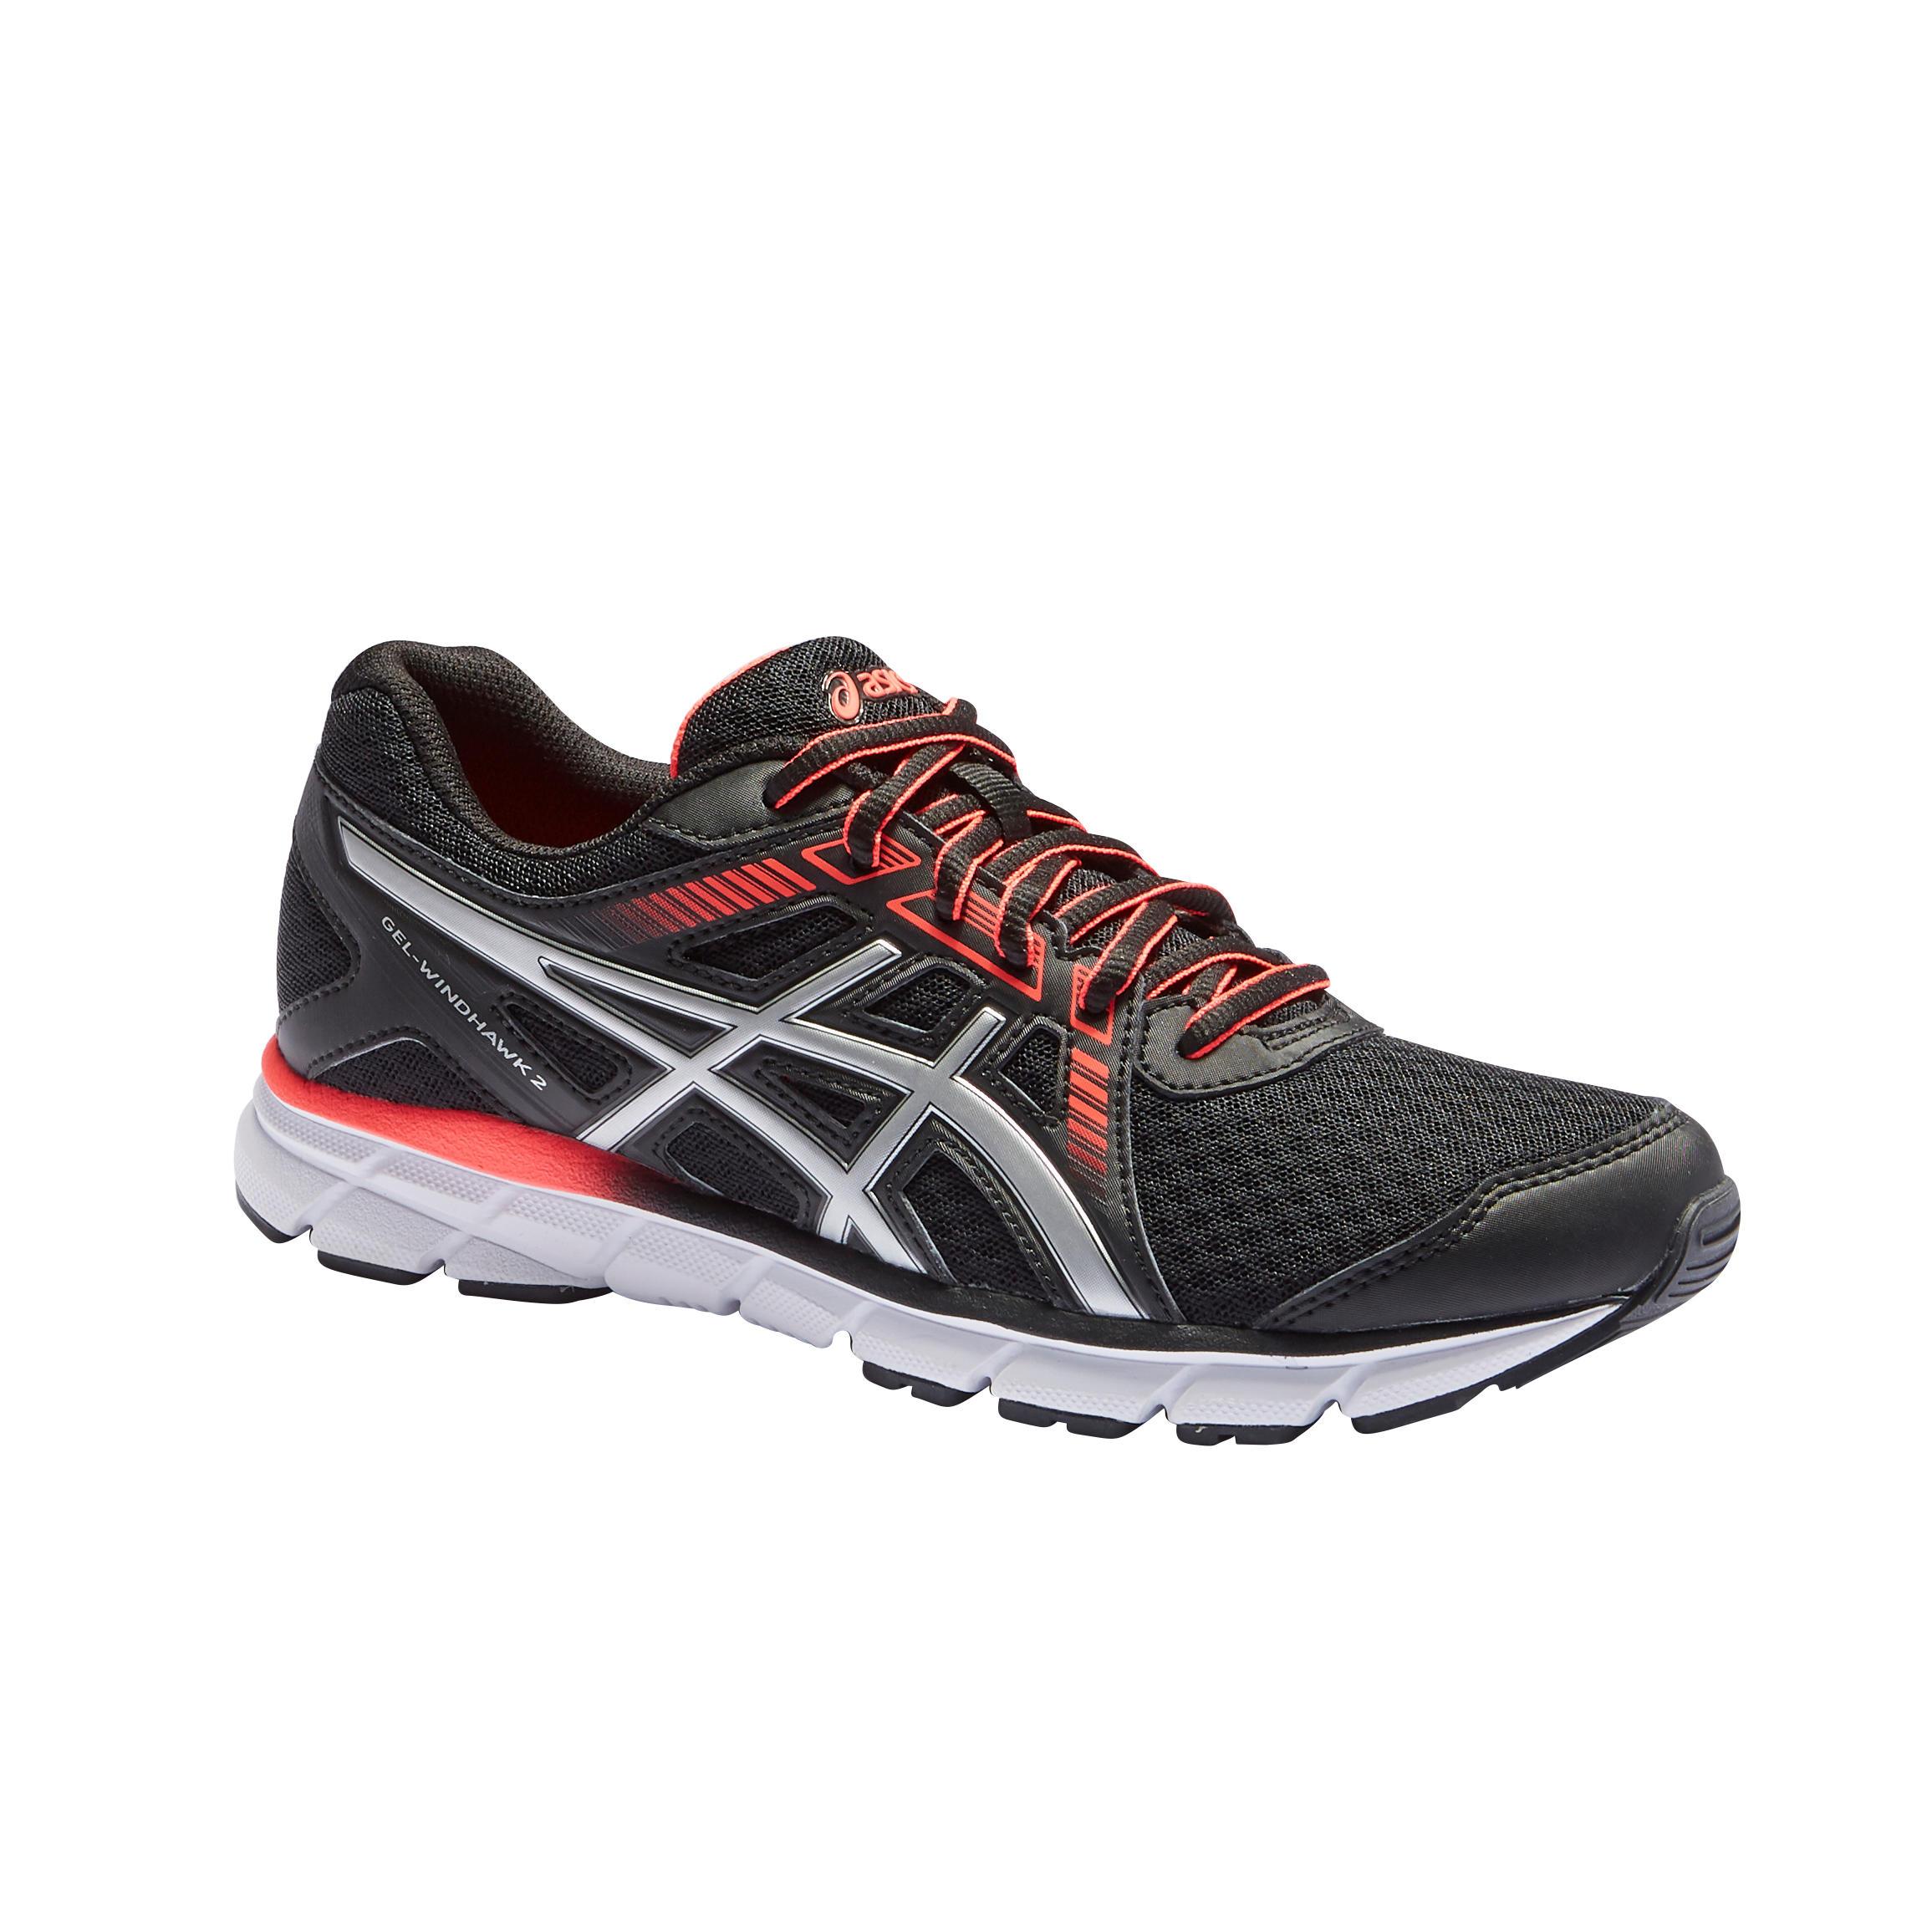 7b127849b Comprar Zapatillas de running para correr mujer